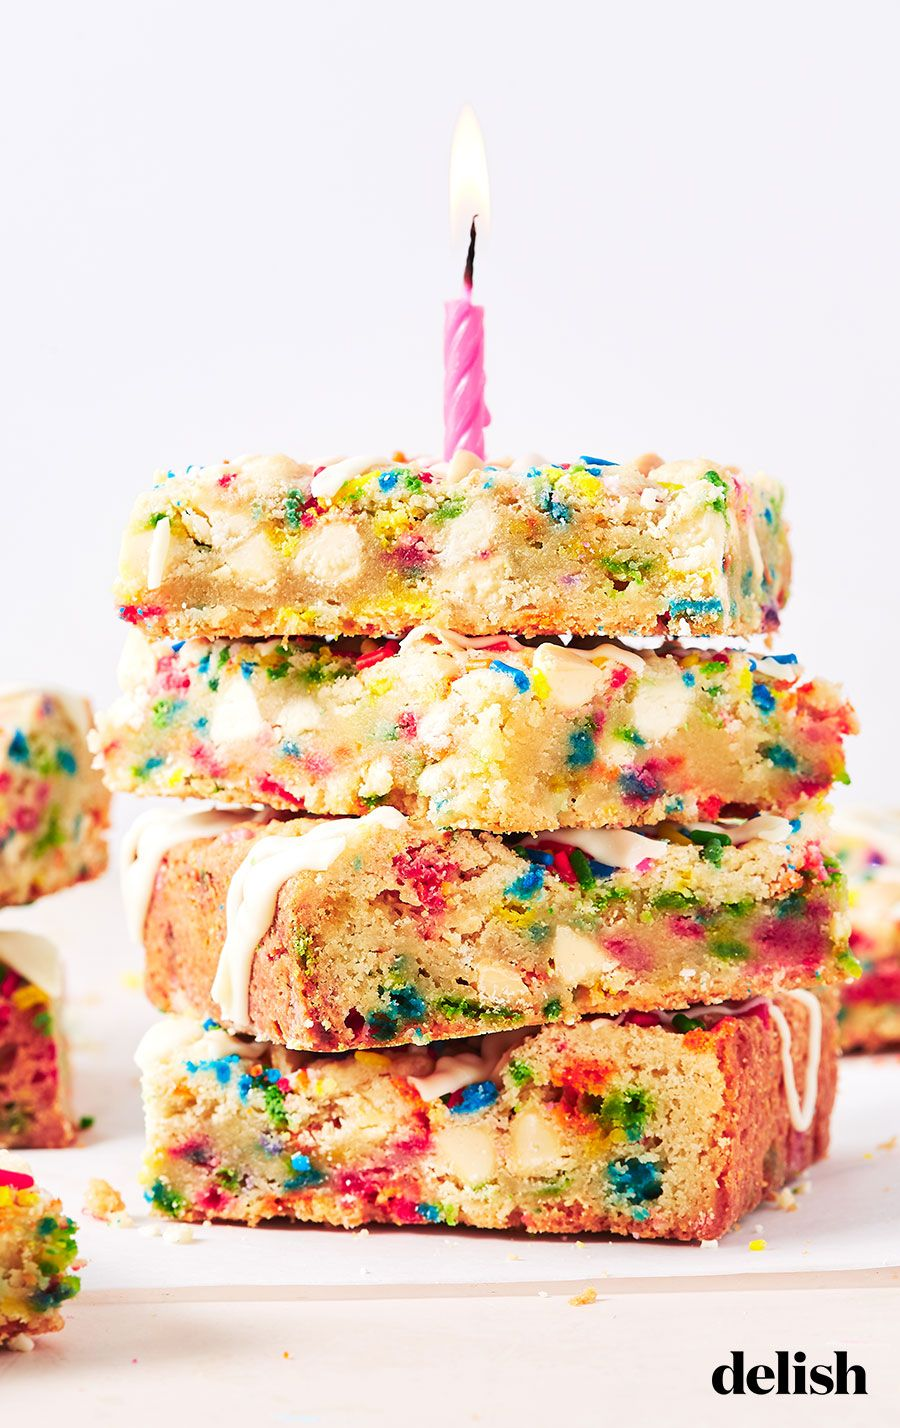 Sensational Birthday Cake Blondies Recipe With Images Desserts Dessert Funny Birthday Cards Online Fluifree Goldxyz